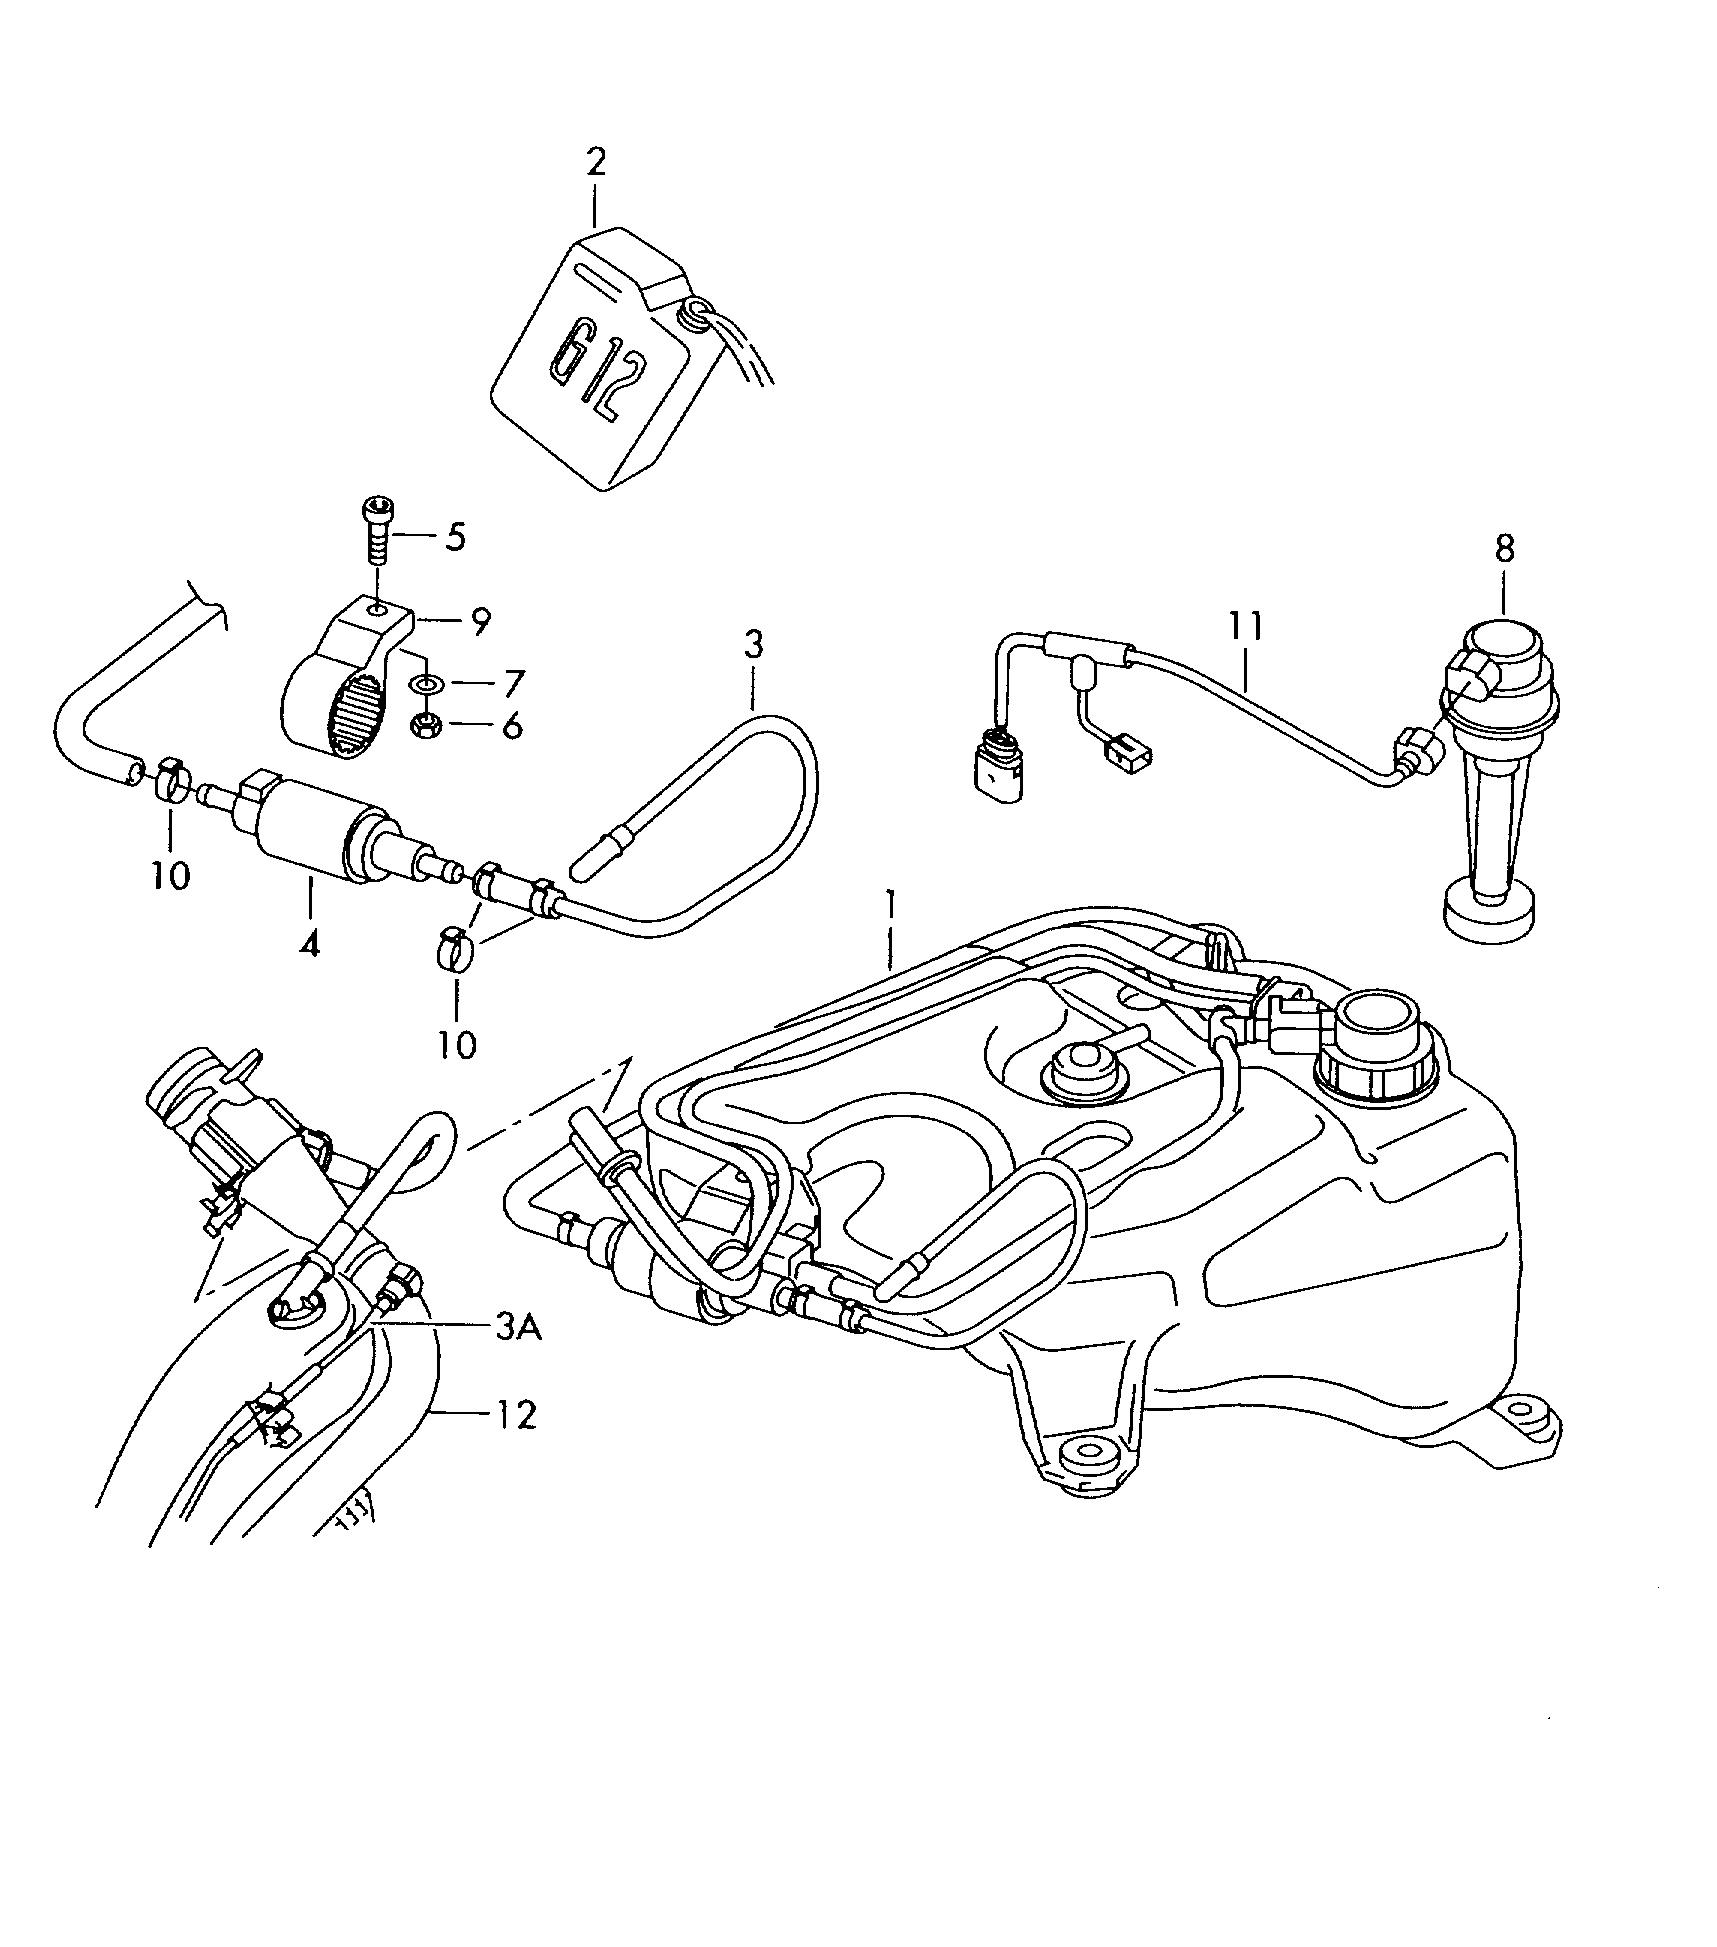 vw touareg fuel system diagram